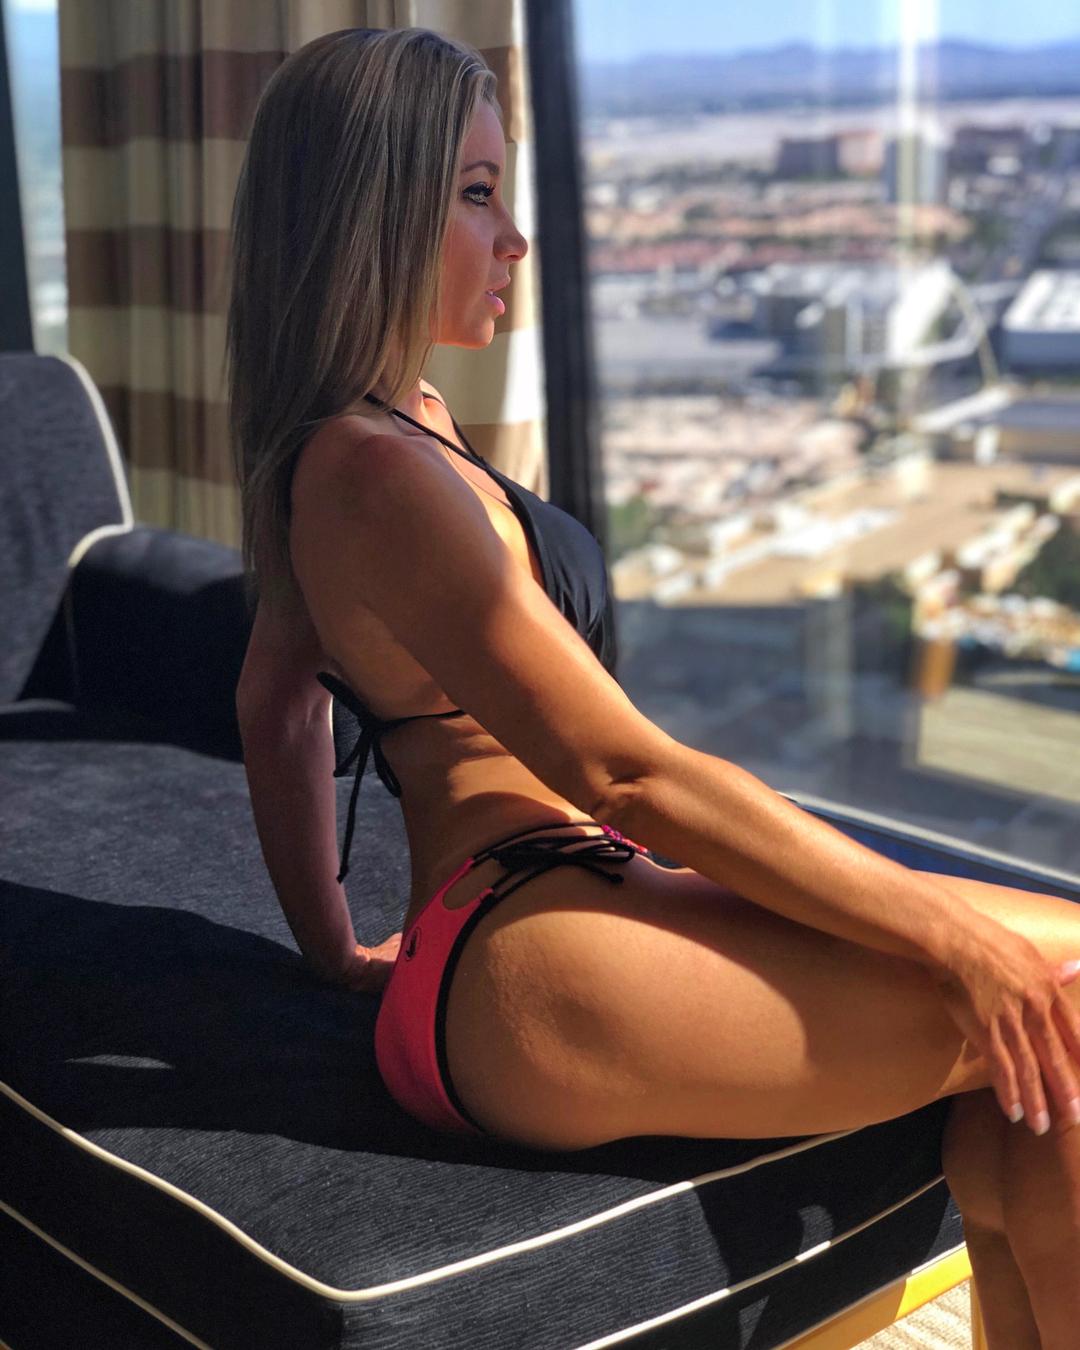 Jeana Smith Naked jeana smith sexy pictures (34 pics) - sexy youtubers